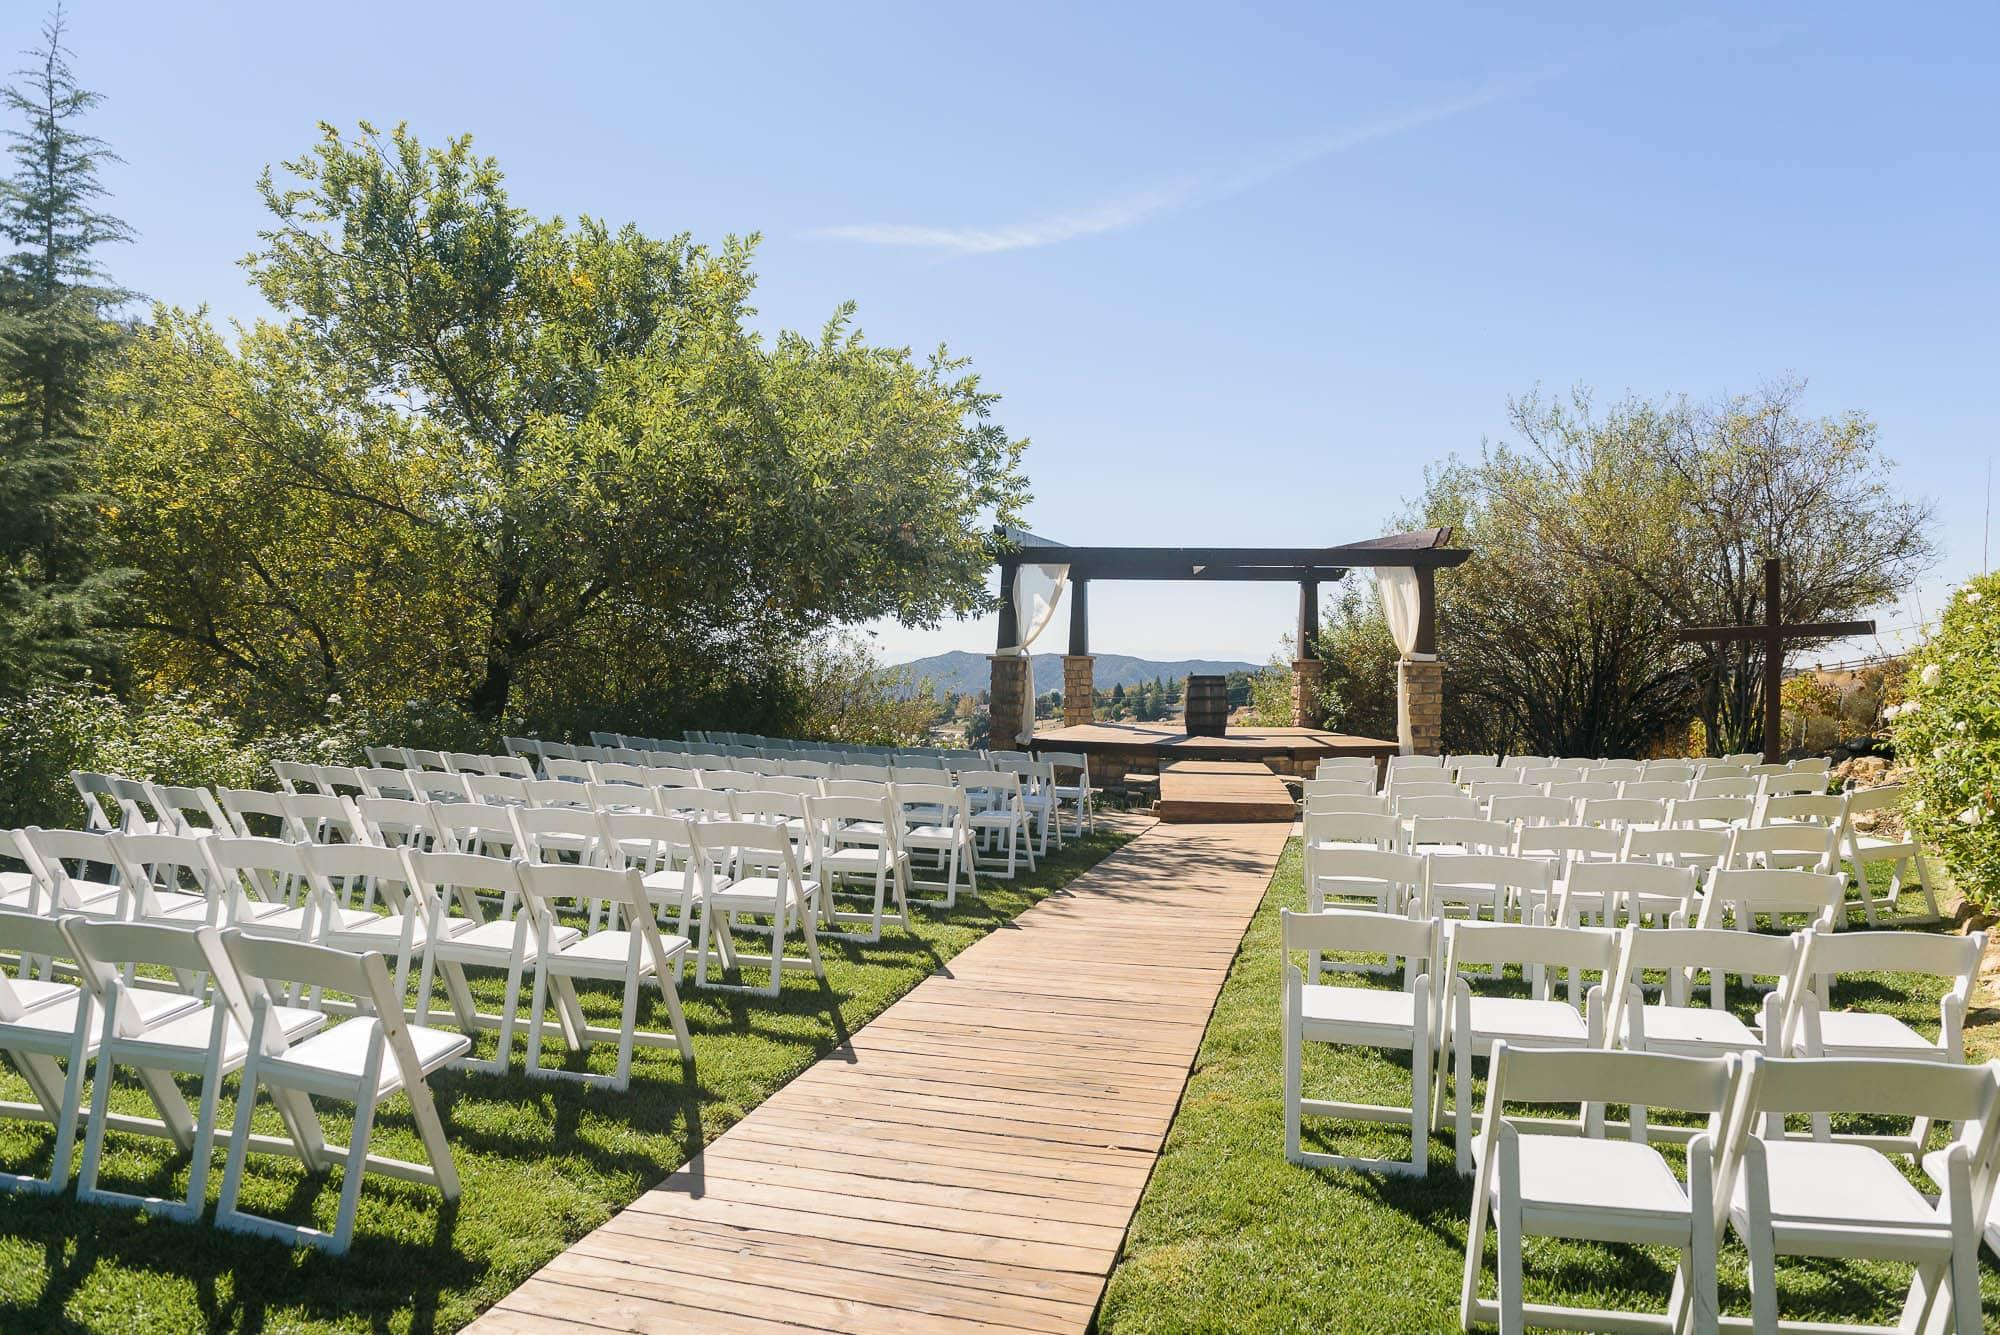 004_Alan_and_Heidi_Serendipity_Garden_Wedding_10-27-2018